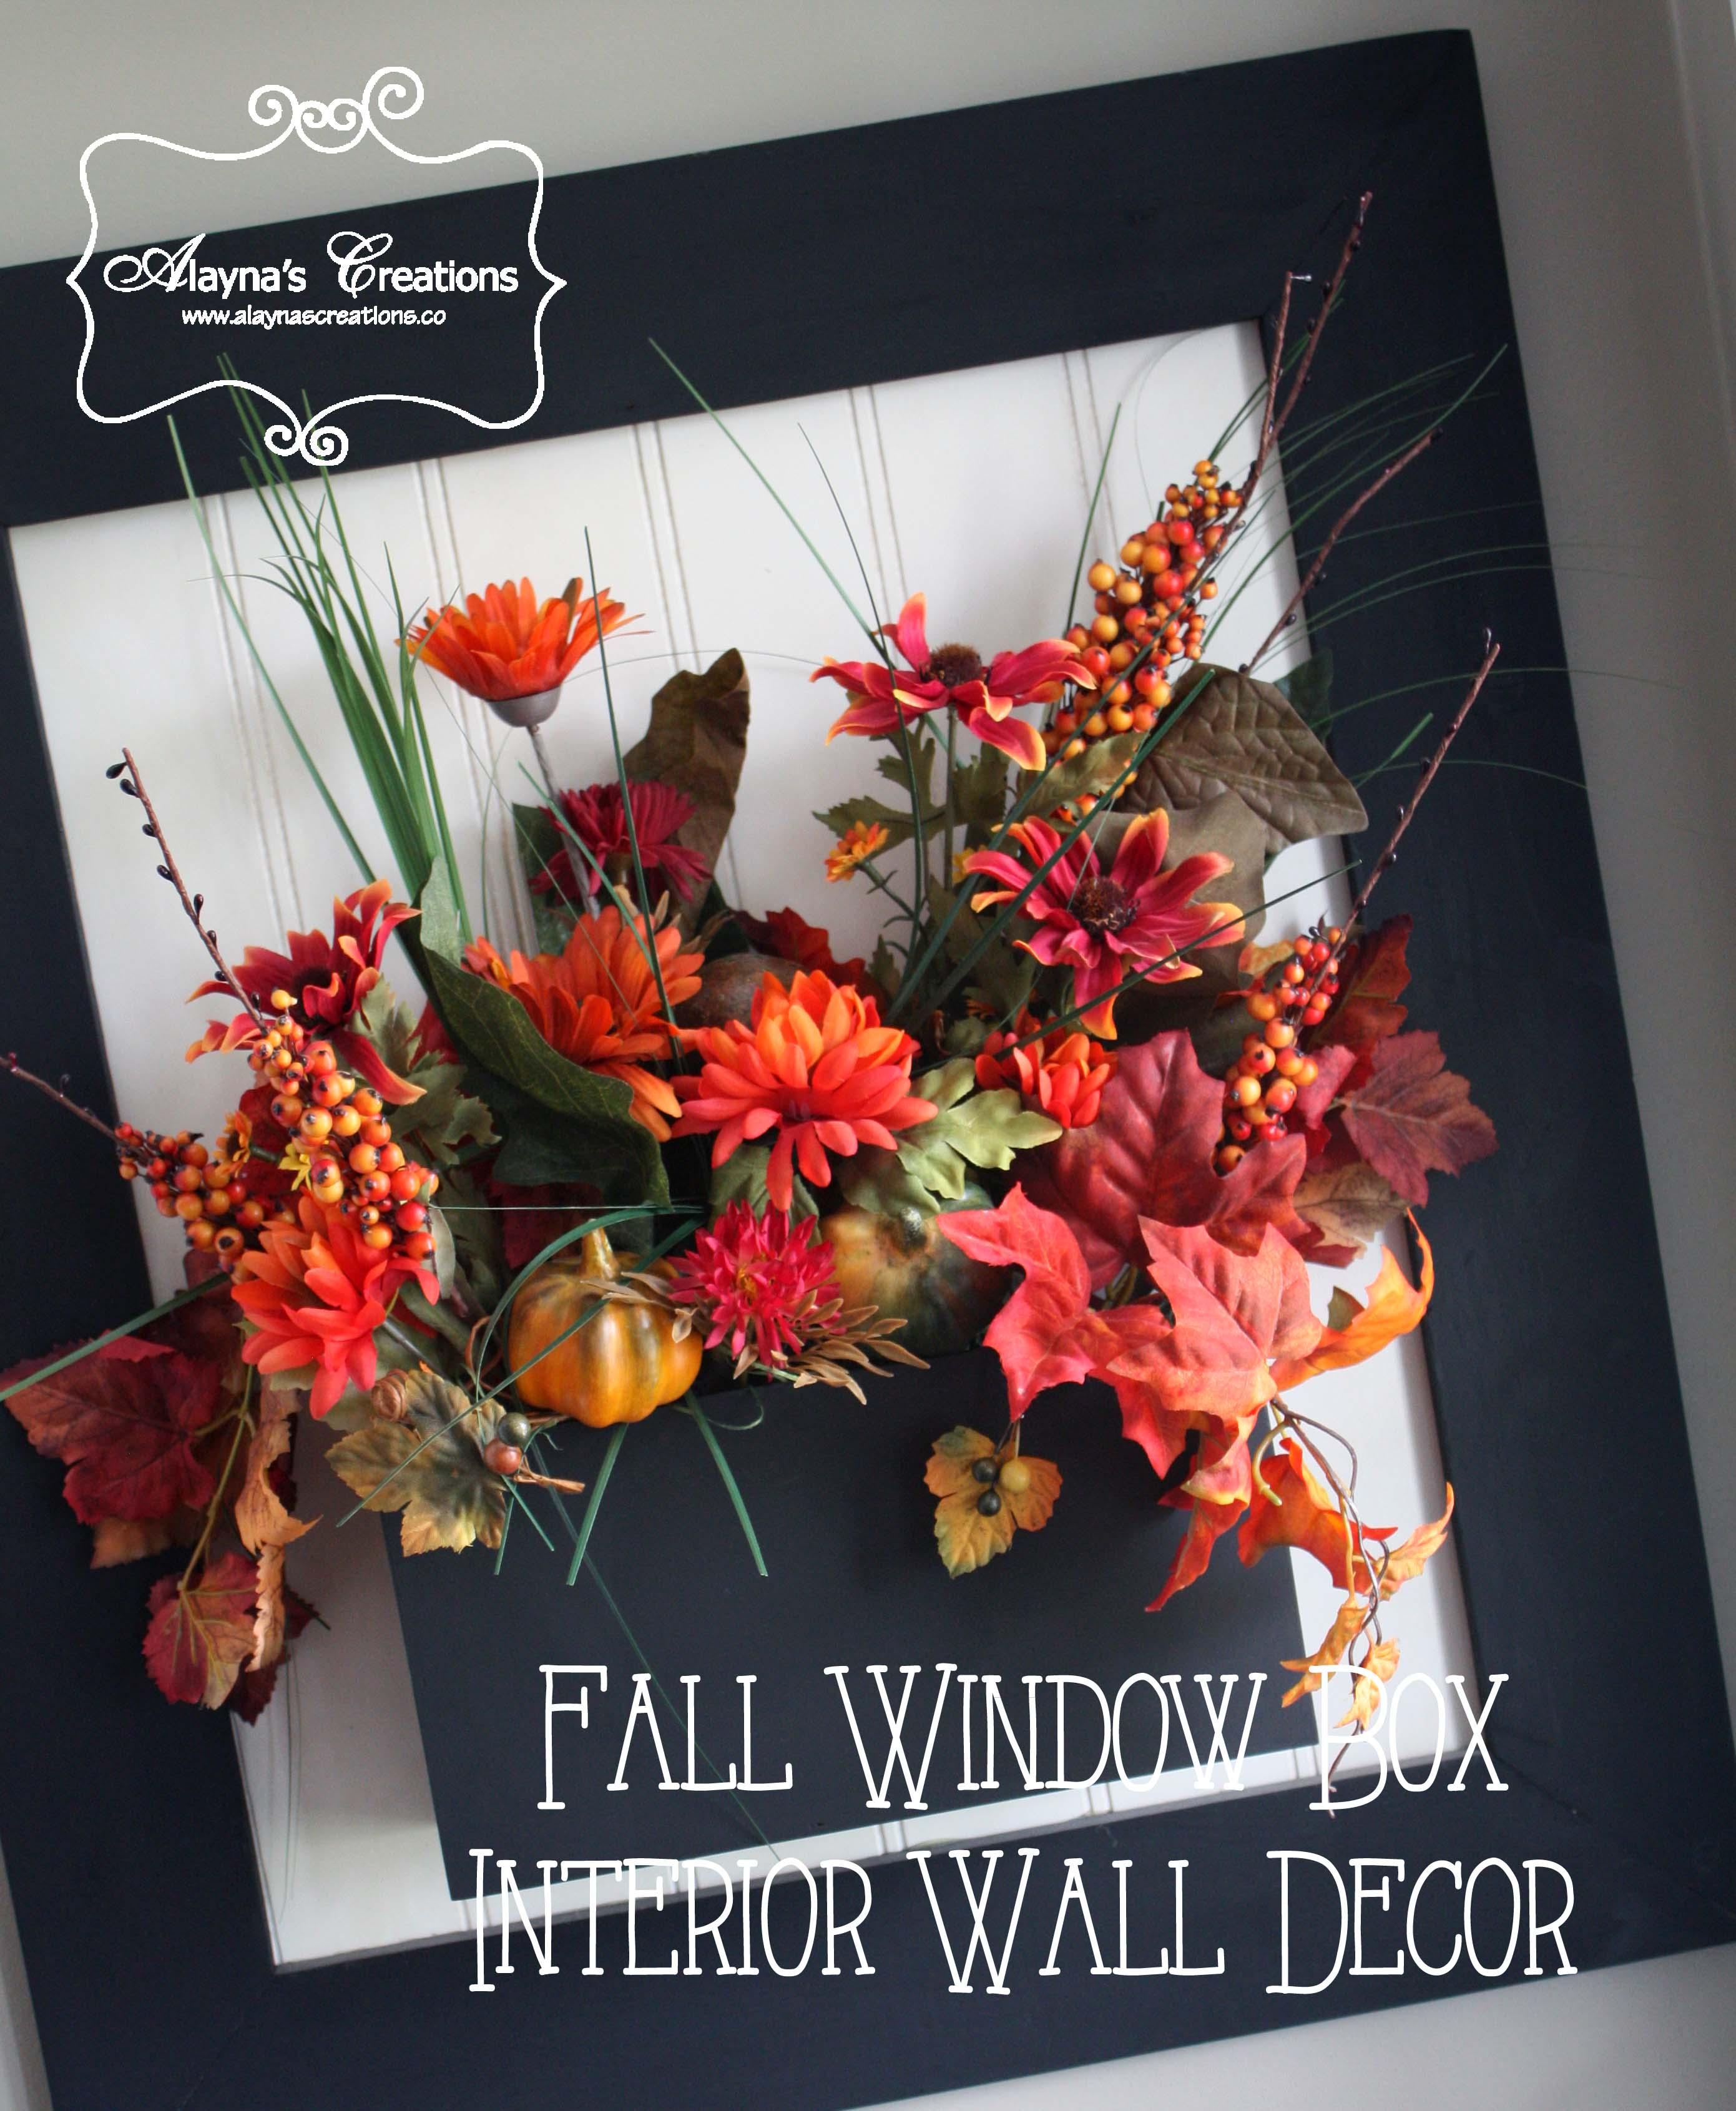 Fall Window Box: Fall Window Box Wall Decor